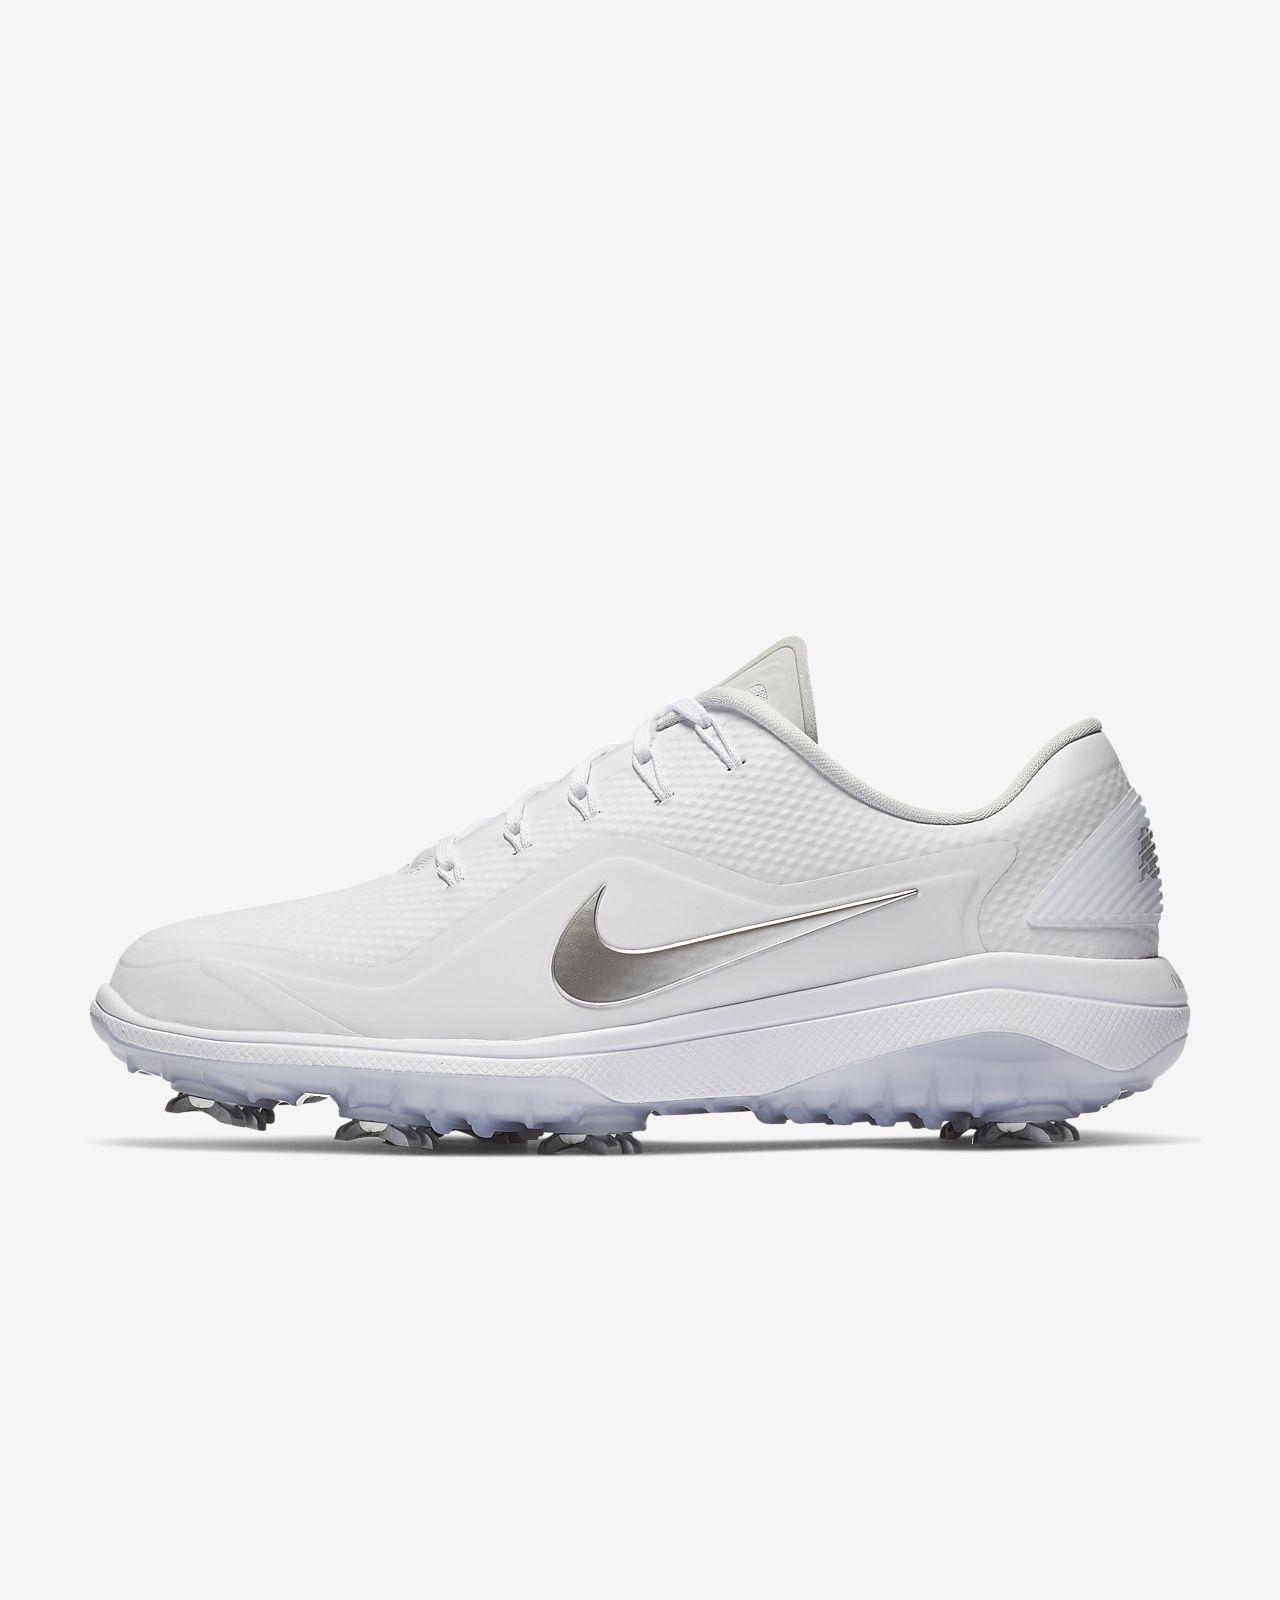 Damskie buty do golfa Nike React Vapor 2